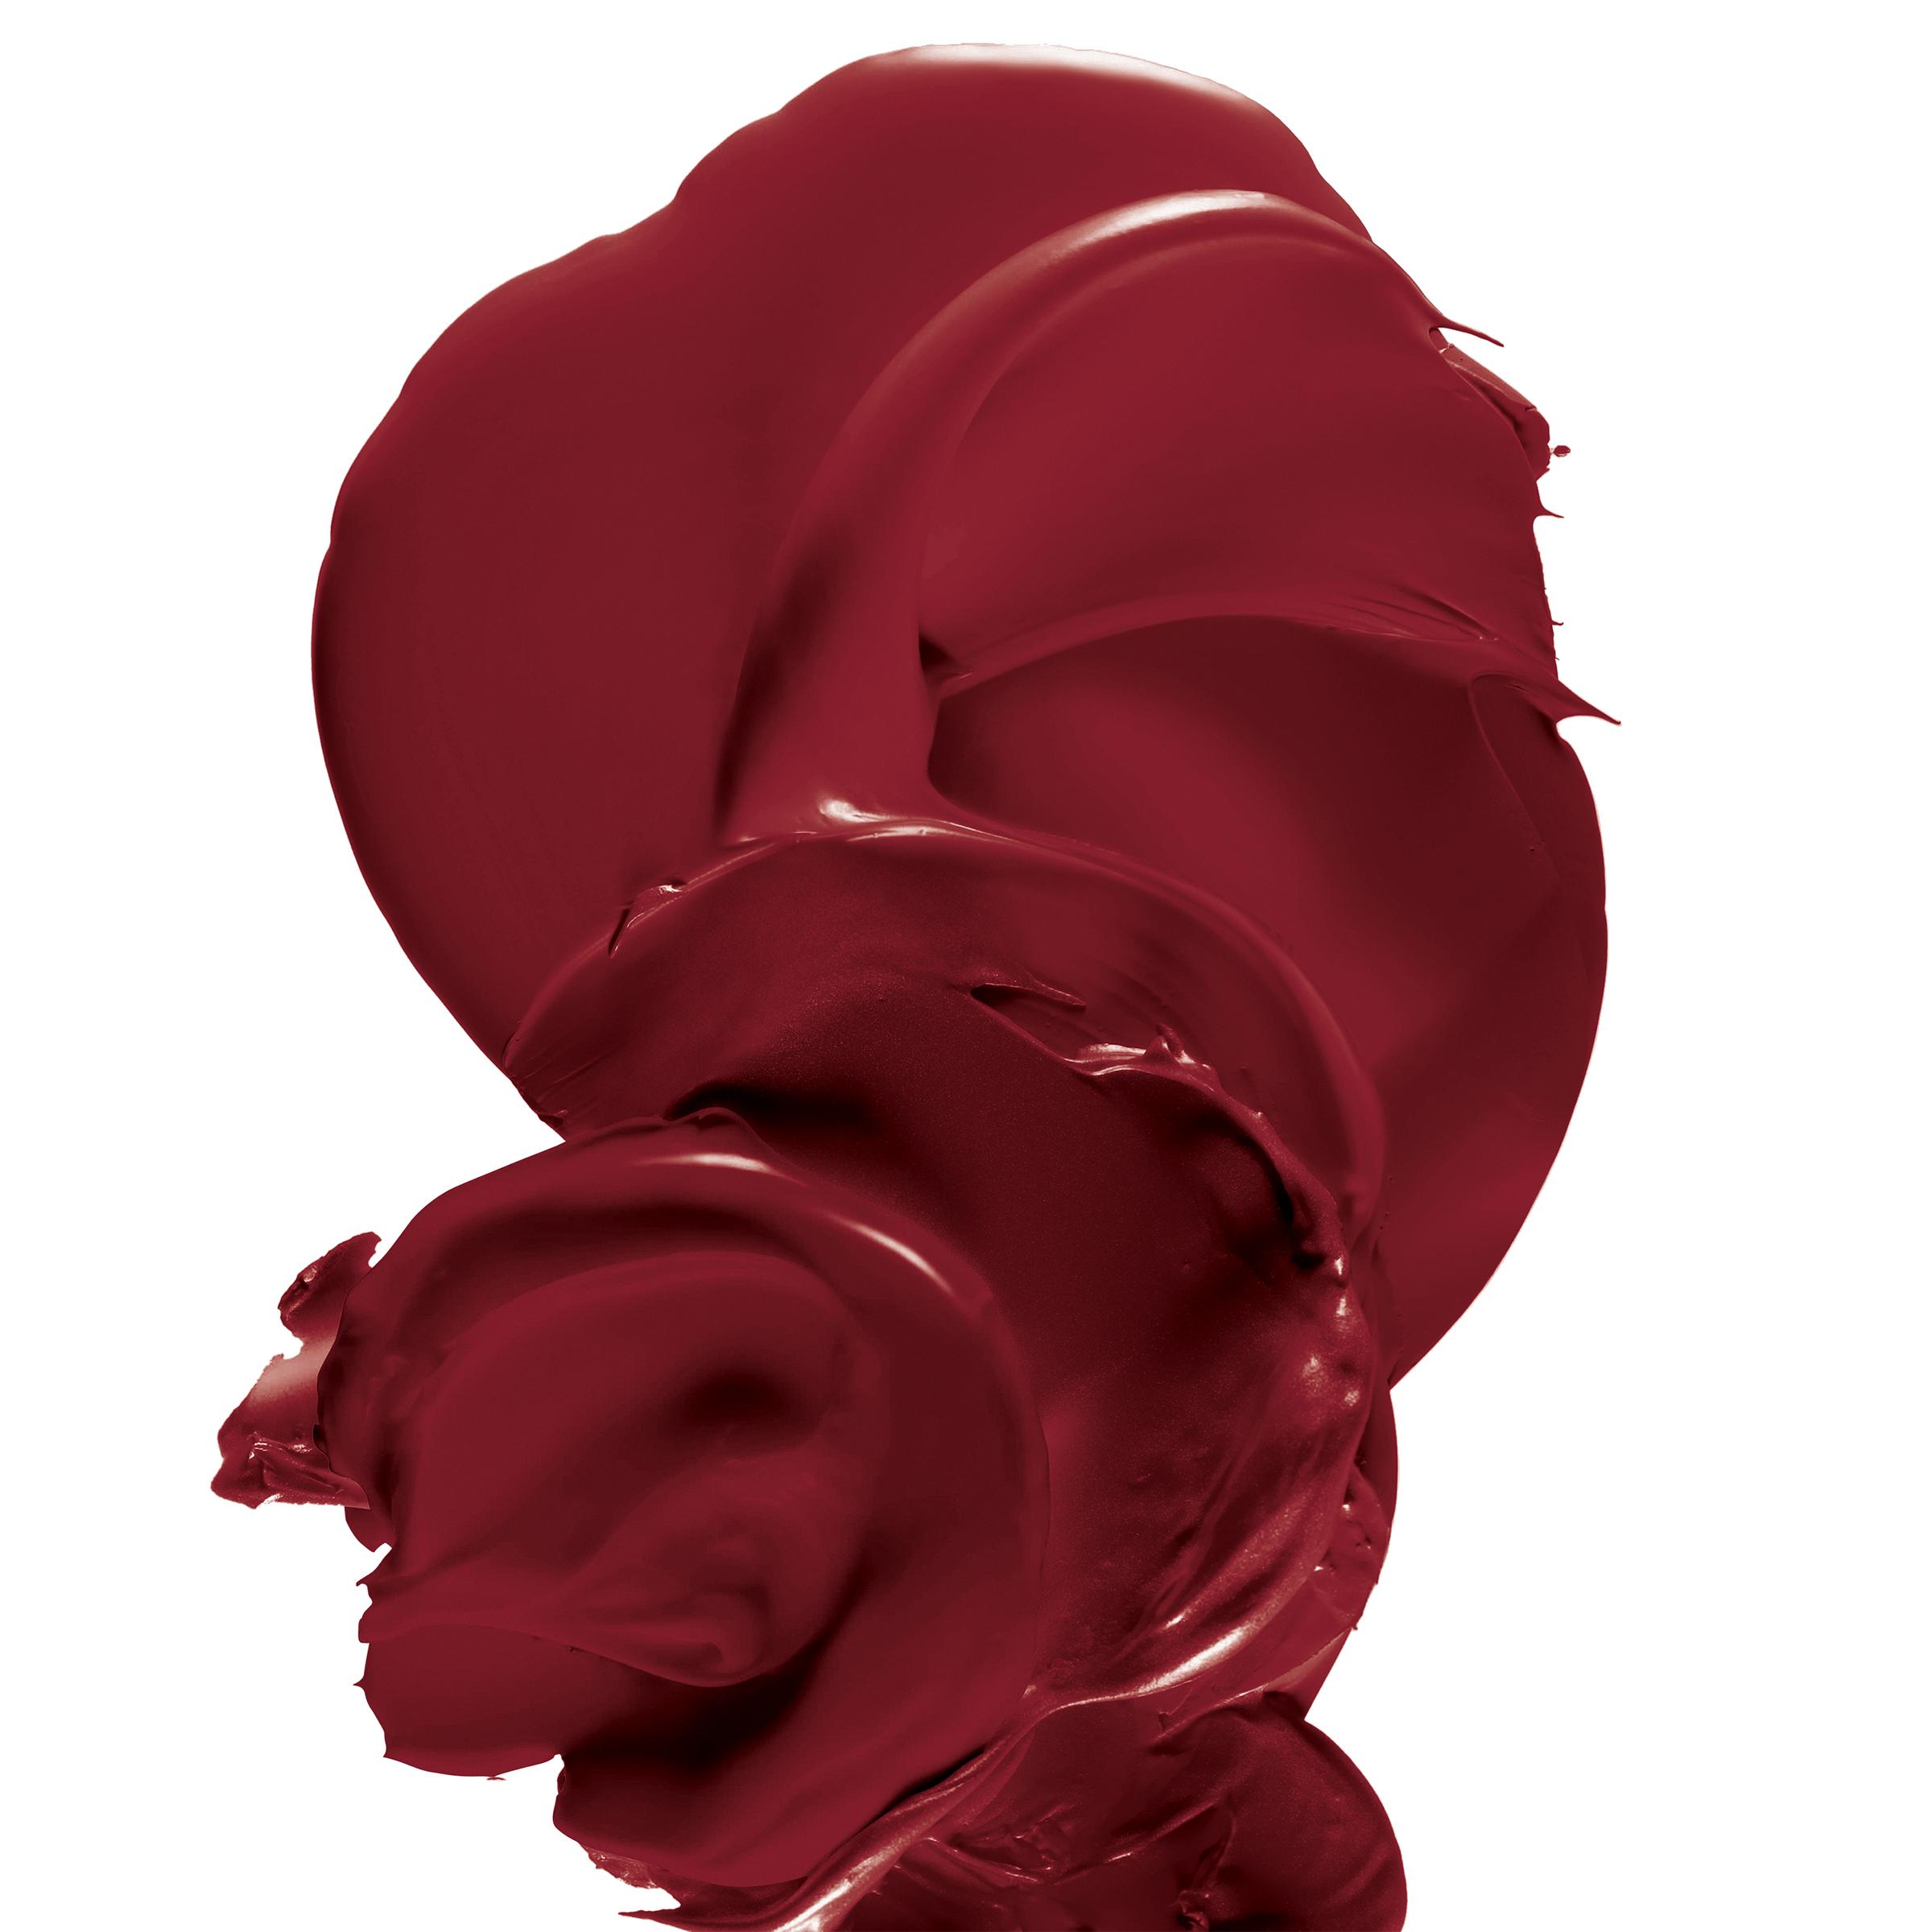 LOreal-Paris-Makeup-Colour-Riche-Original-Hydrating-Satin-Lipstick